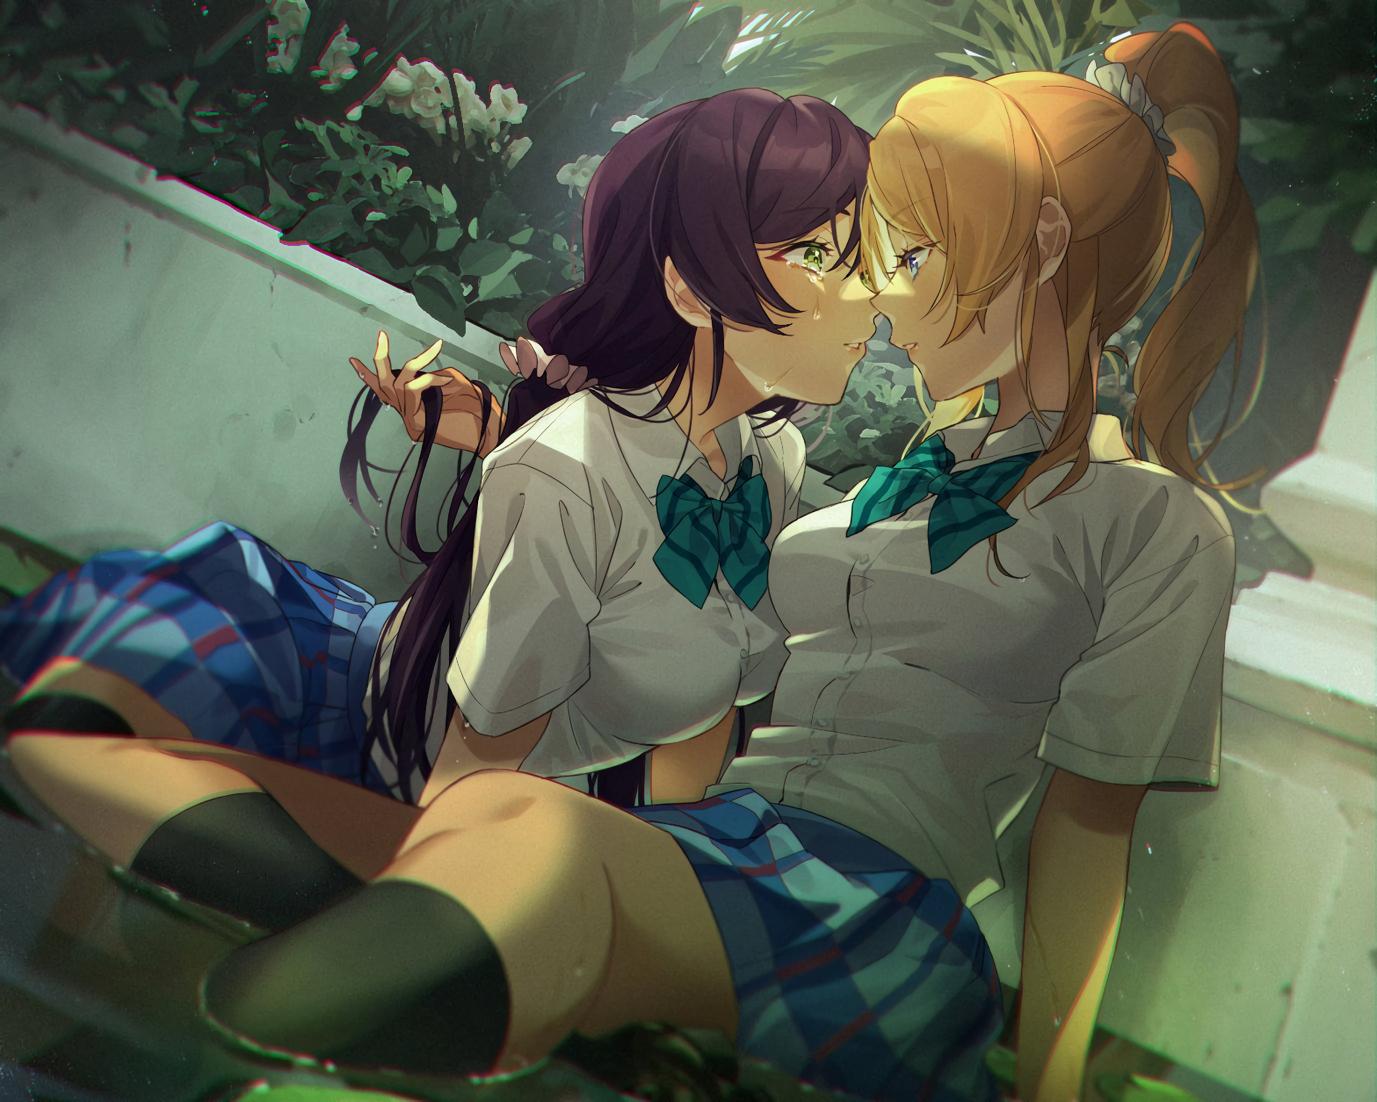 2girls ayase_eri blonde_hair green_eyes kneehighs long_hair love_live!_school_idol_project ponytail purple_hair school_uniform shoujo_ai skirt tears tie toujou_nozomi water zawawa_(satoukibi1108)